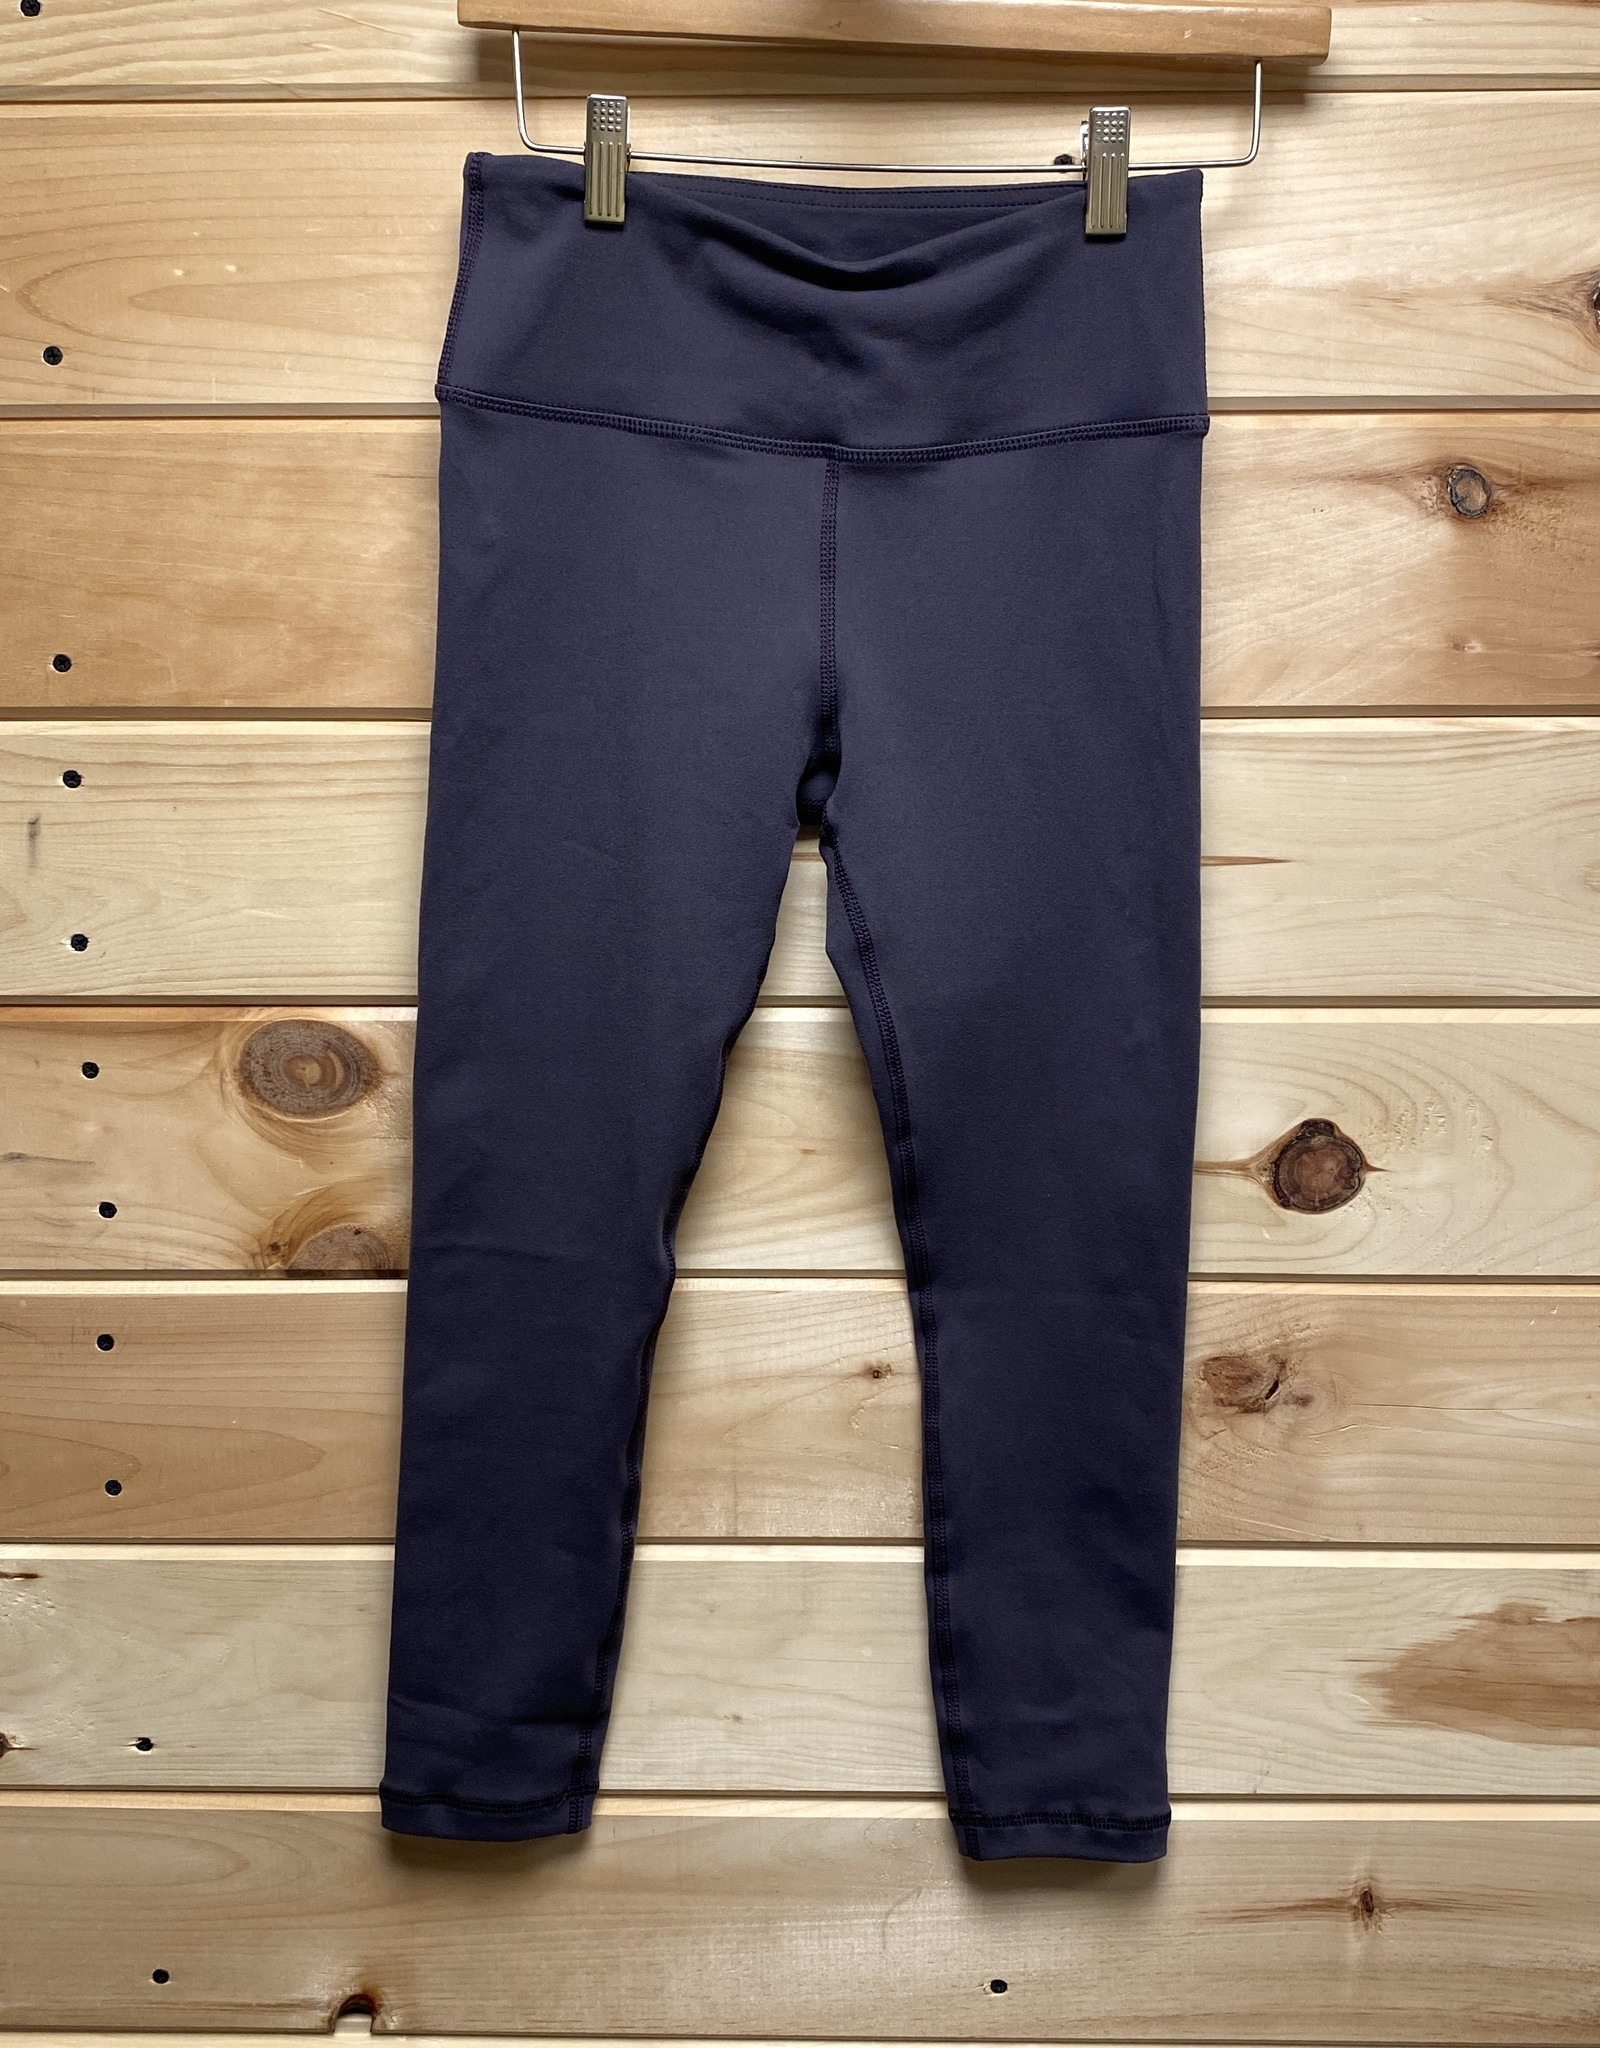 Vimmia Gray Solid Legging